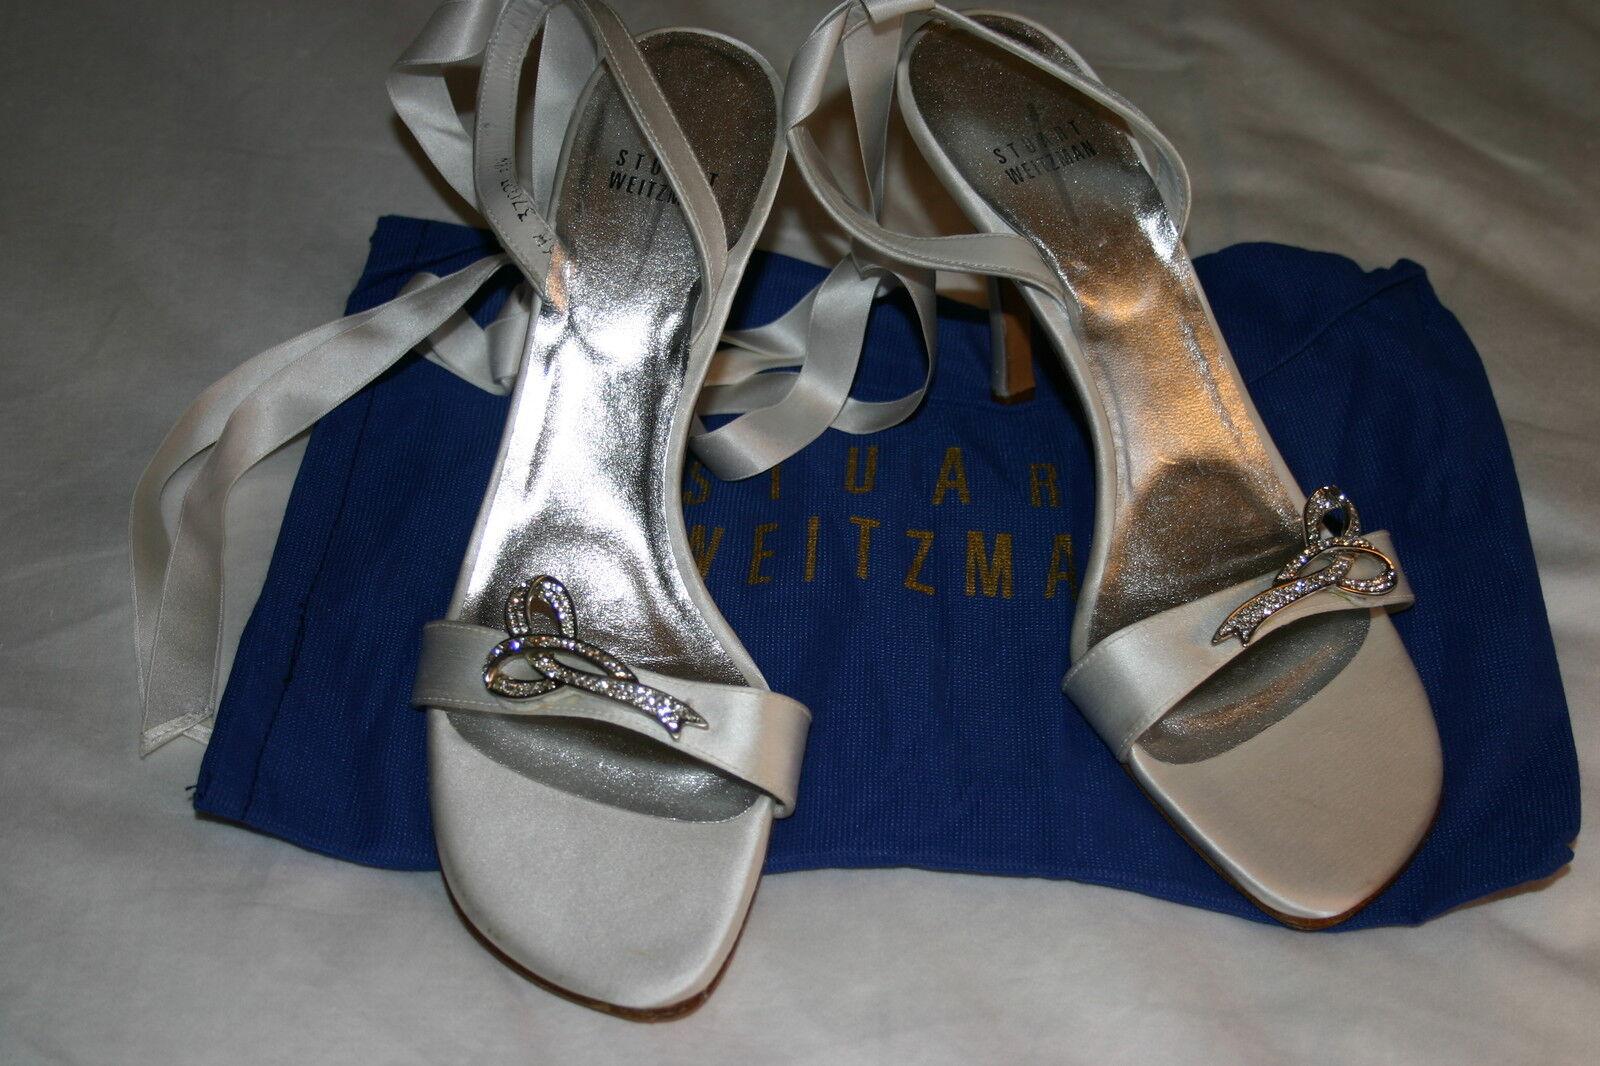 punto vendita STUART STUART STUART WEITZMAN Bridal bianca Ribbon JEWELED Sandals scarpe Sz 8.5 N  265 NWOB  negozio di vendita outlet